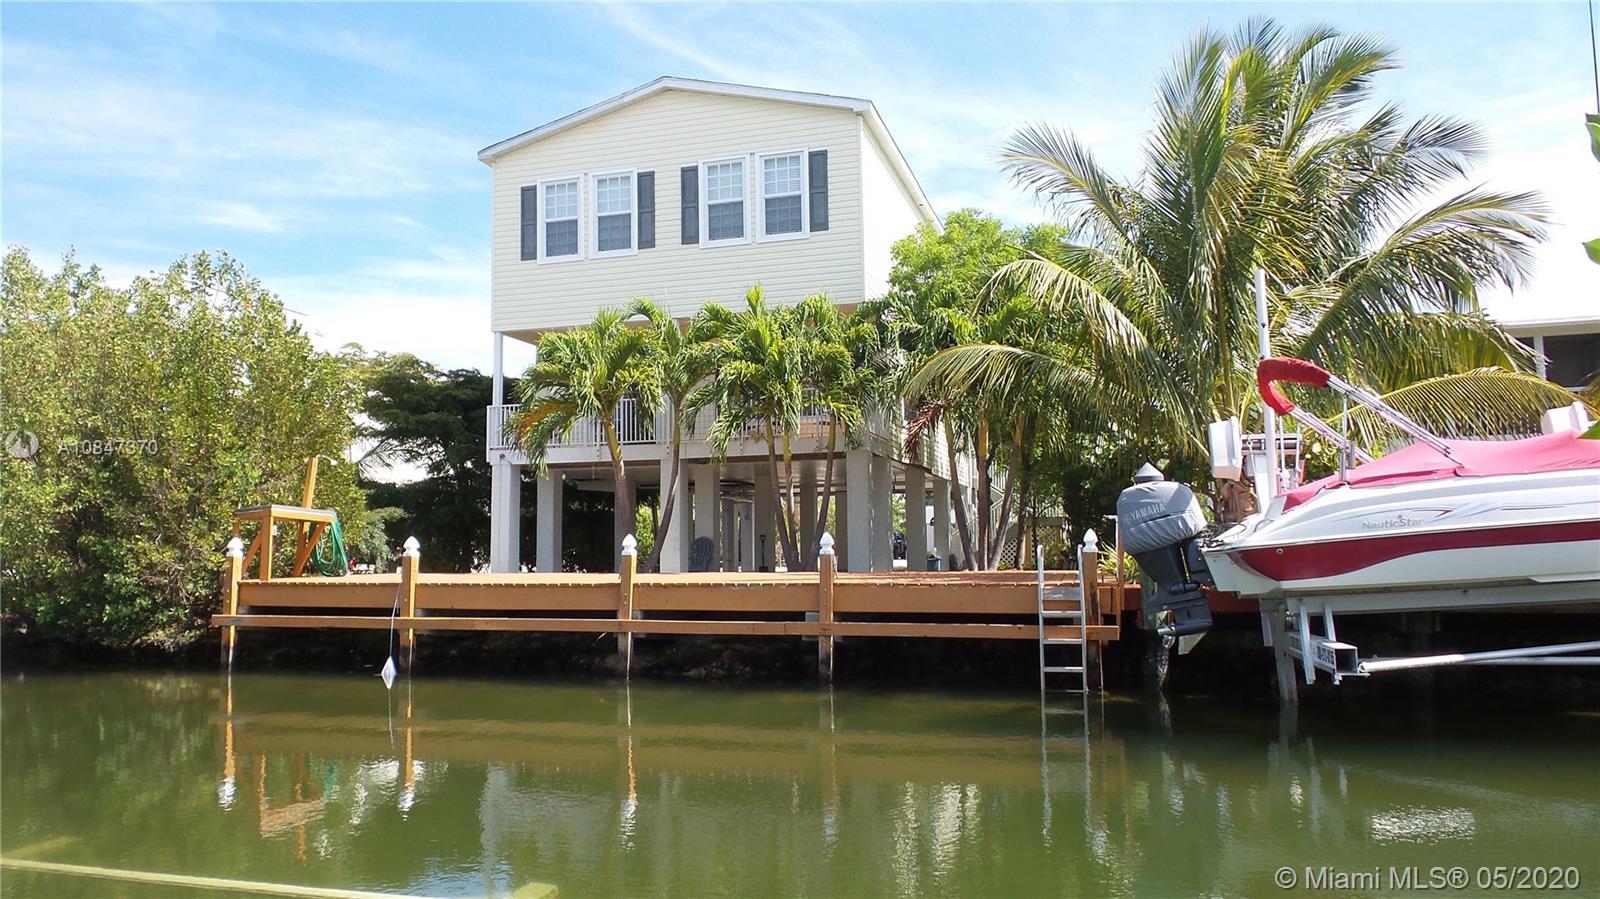 27395 Barbuda Ln Property Photo - Big Pine, FL real estate listing